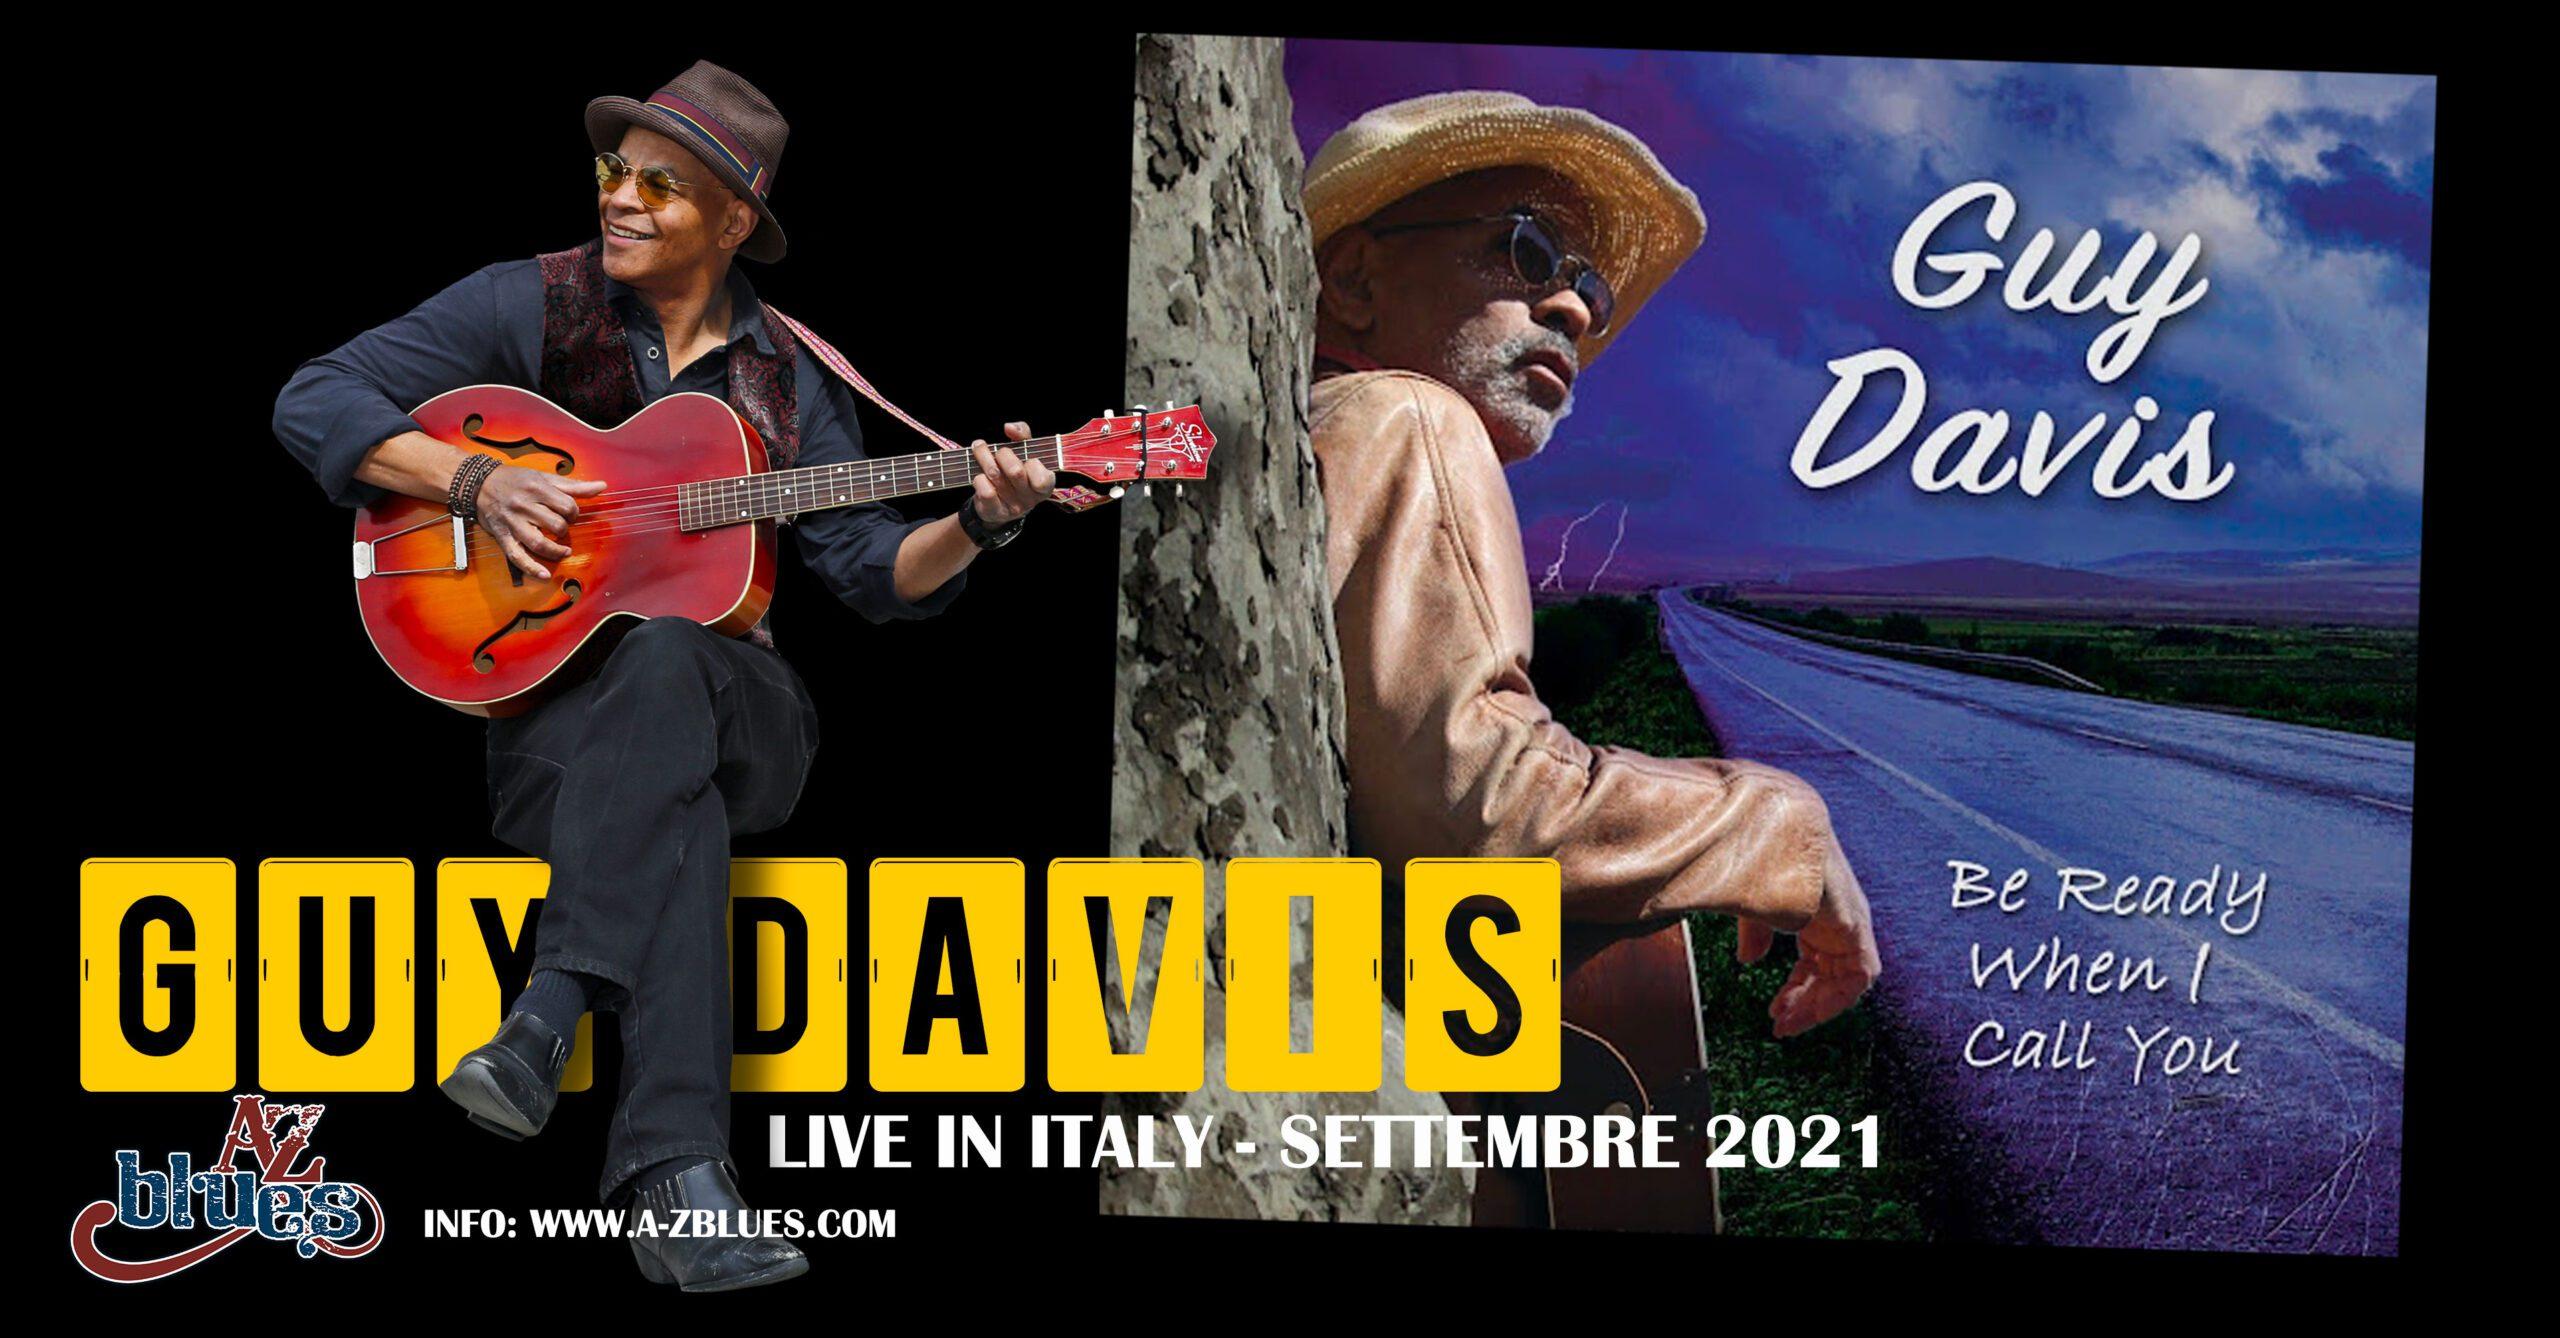 Guy Davis live in Italy con A-Z Blues